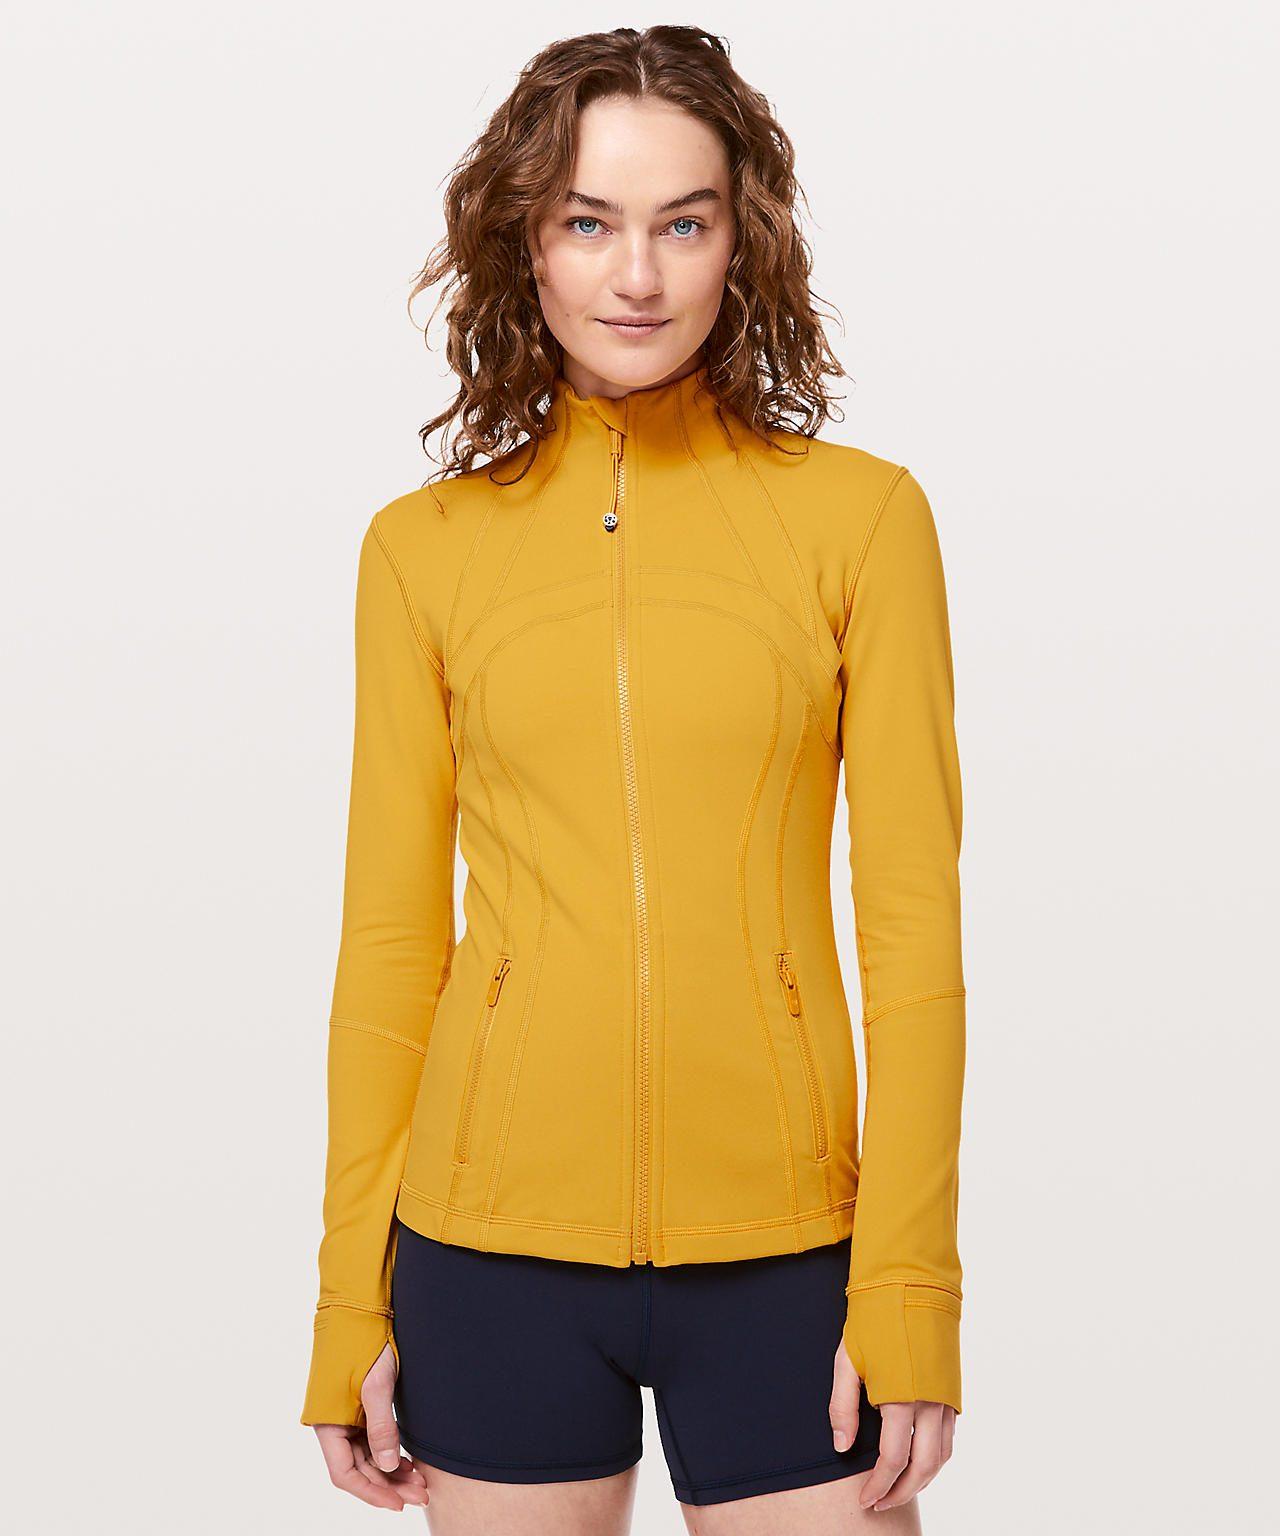 Define Jacket Honey Lemon